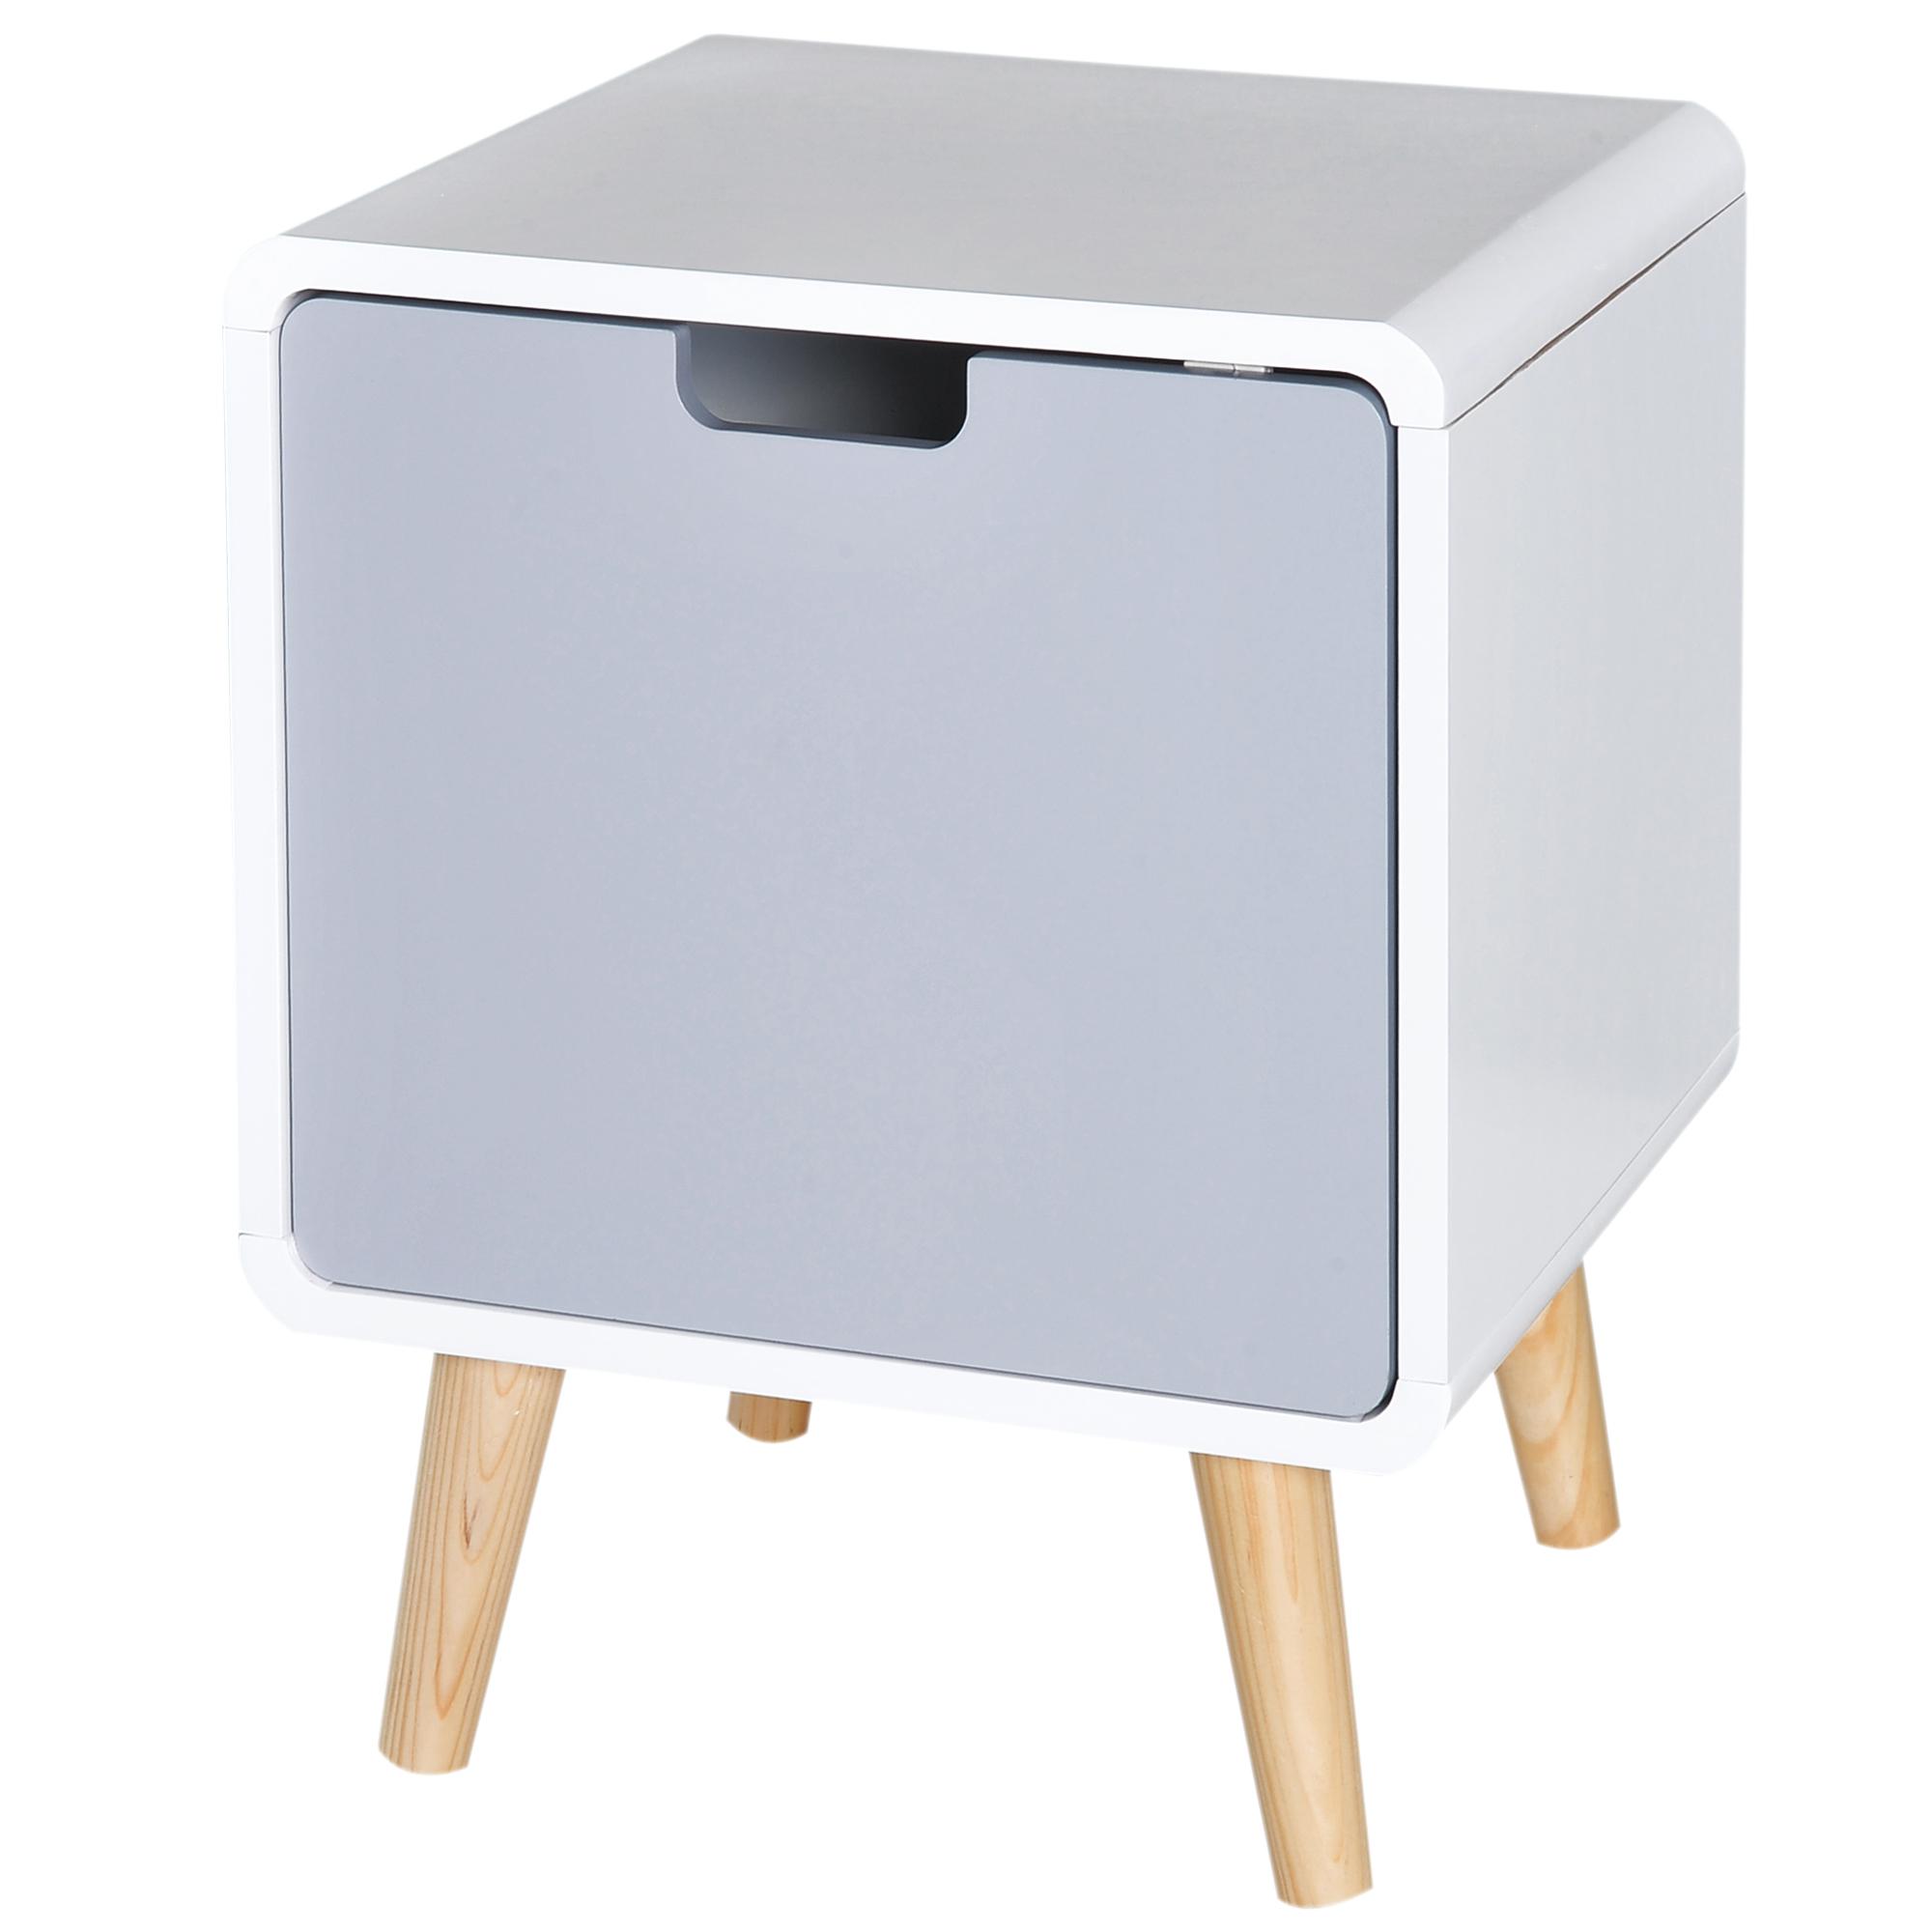 Chevet design scandinave avec placard MDF blanc bleu gris